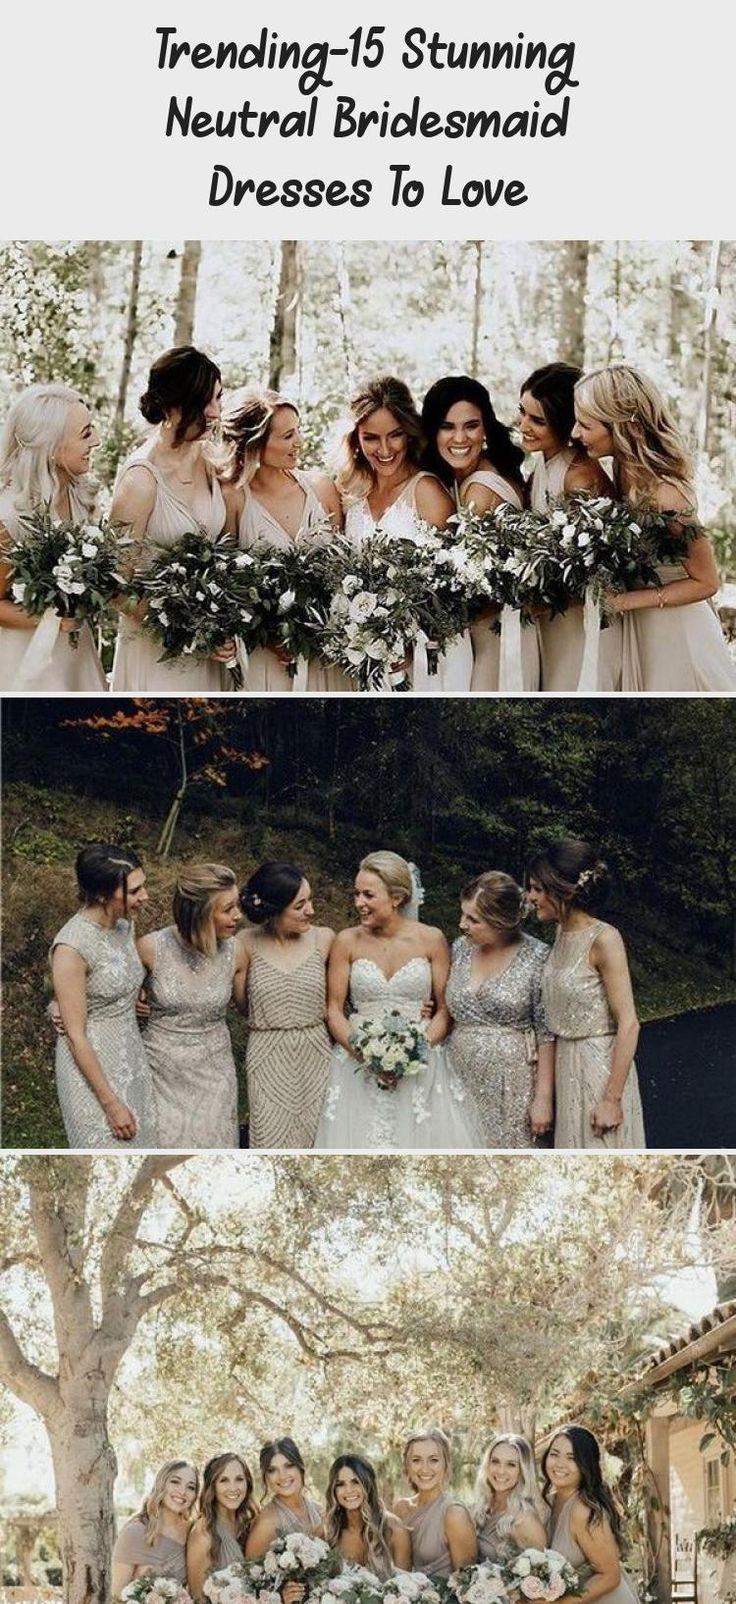 neutral champagne bridesmaid dresses #obde #weddingideas2019 #BridesmaidDressesVintage #MaroonBridesmaidDresses #PinkBridesmaidDresses #BridesmaidDressesPlusSize #AfricanBridesmaidDresses